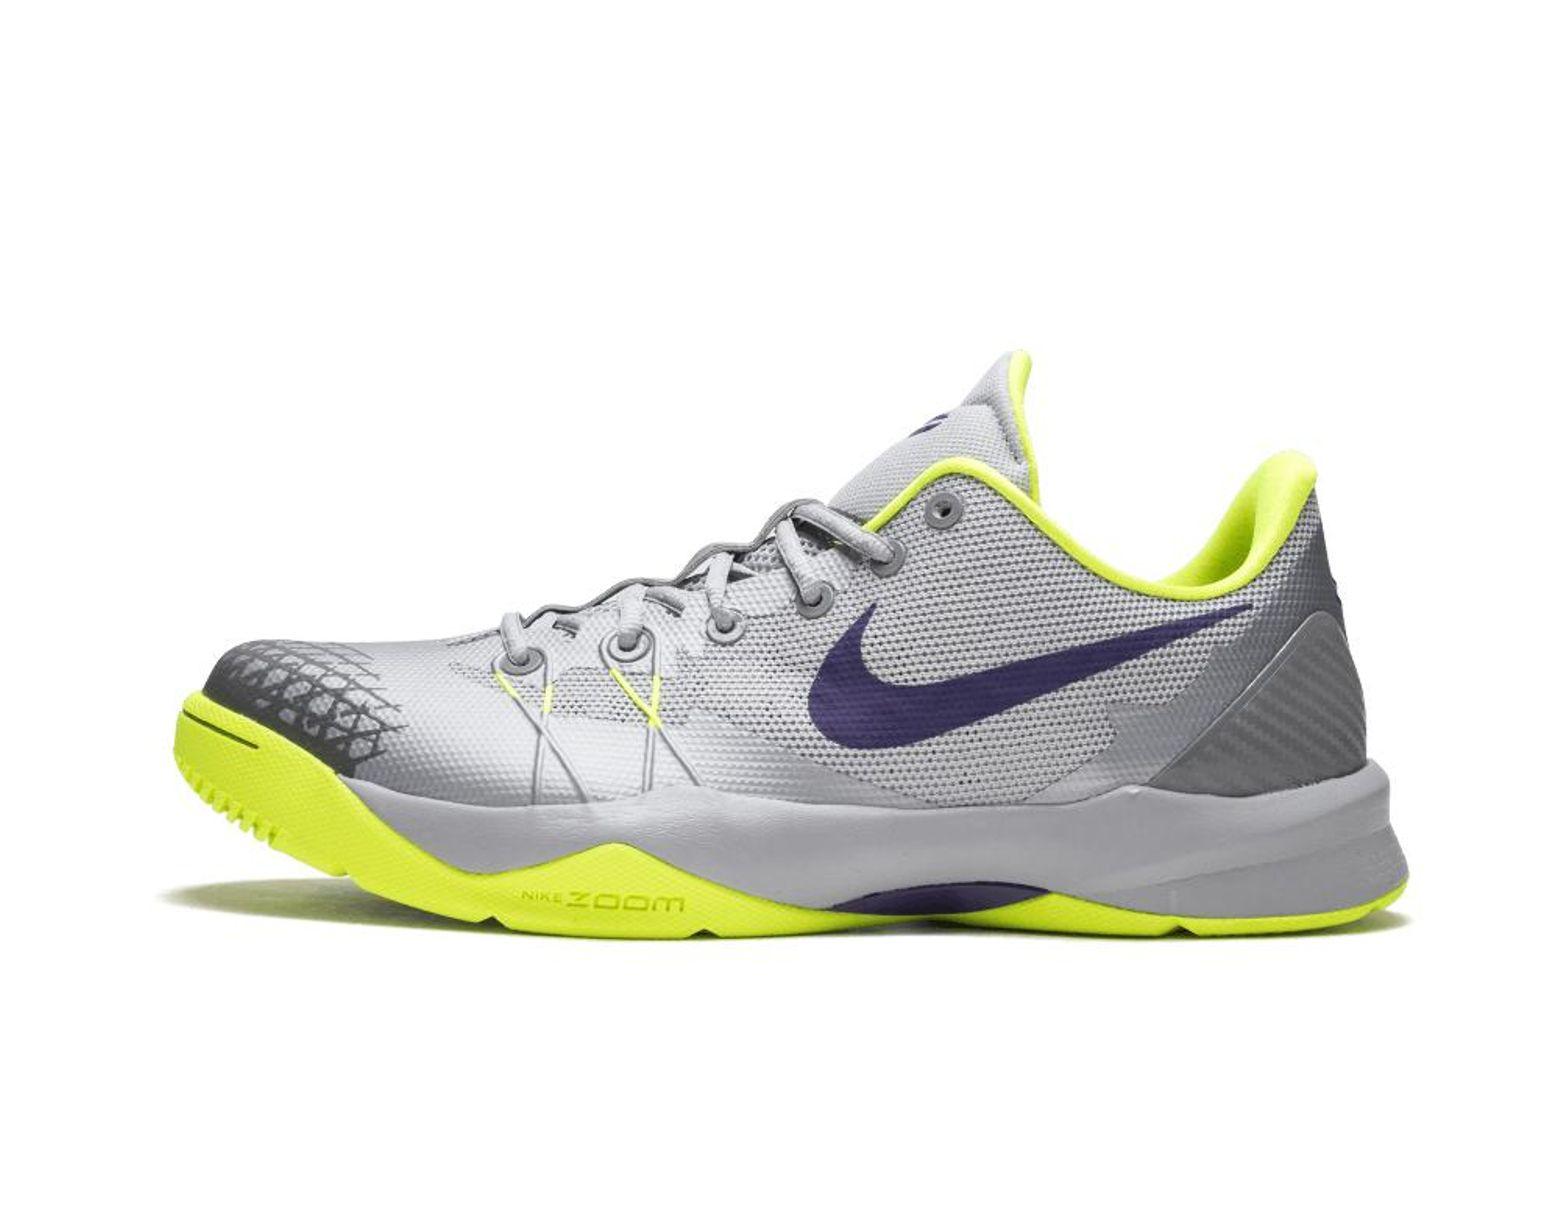 new product a7301 7a6b4 Nike. Zoom Kobe Venomenon 4 - Size 12